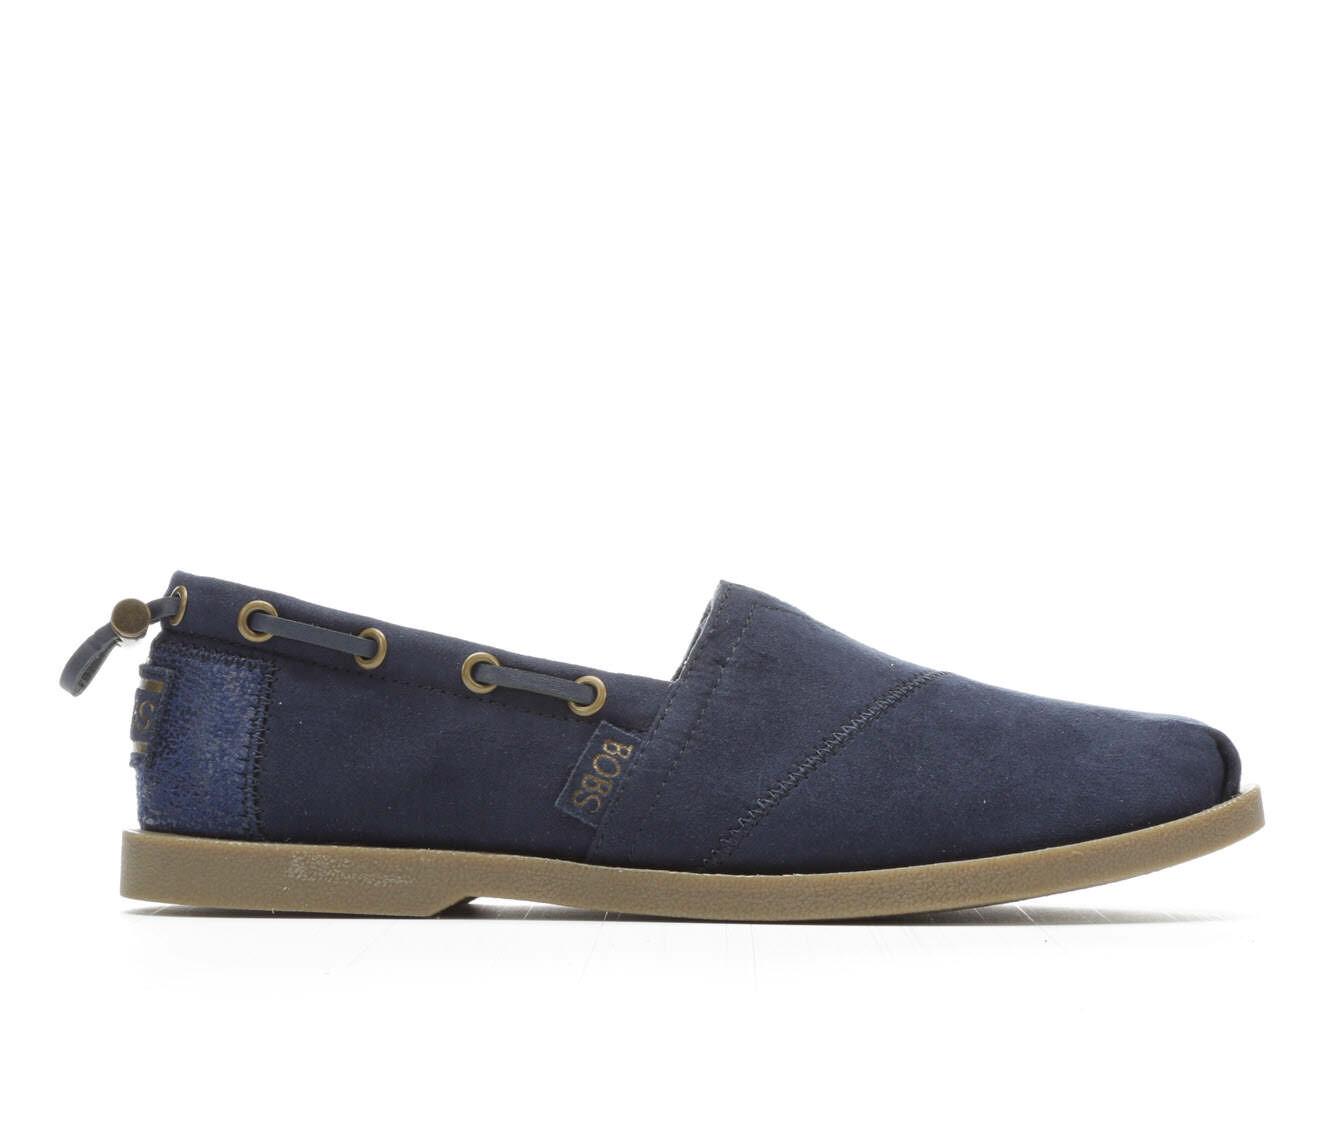 bobs shoes for women camo